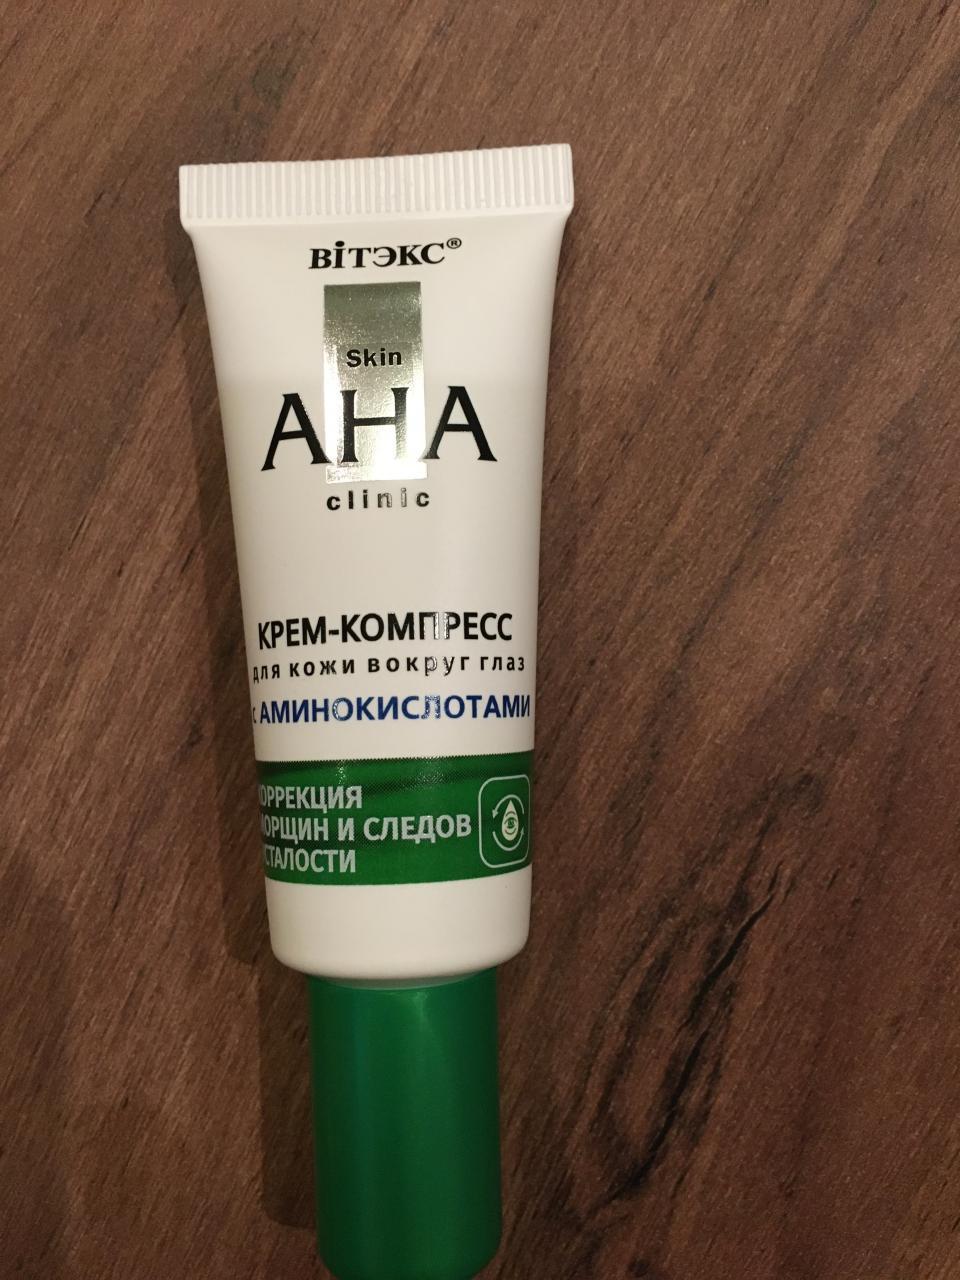 Отзыв на товар: Крем-компресс для кожи вокруг глаз с аминокислотами Skin aha clinic. Белита - Витэкс.